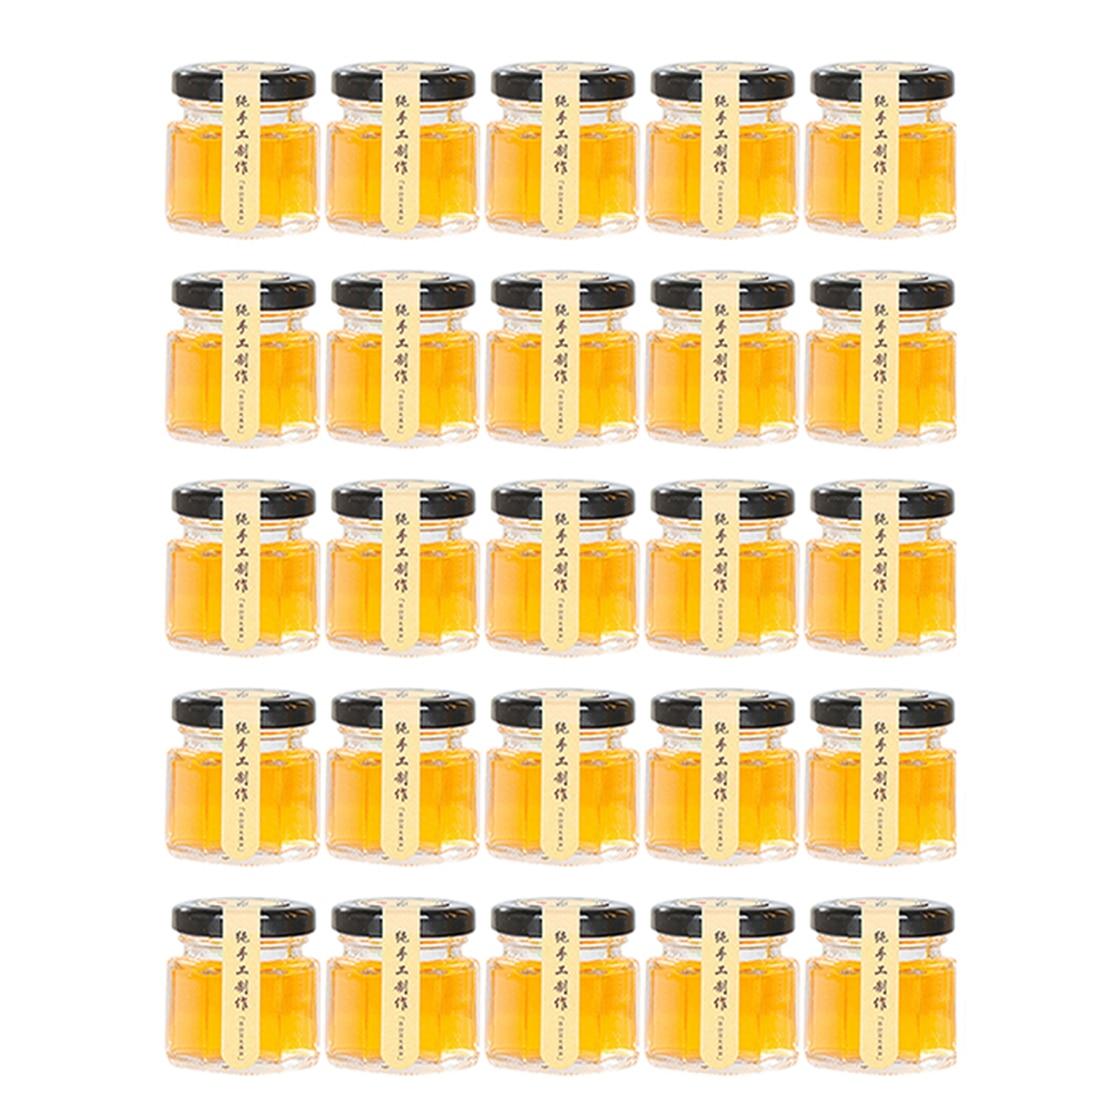 Drop ship 25Pcs/SET 5.1 x 4.8cm 45ml Hexagon Glass Bottle Jar Spice Jar Crafts Canning Jar for Jam Honey Jelly - Transparent